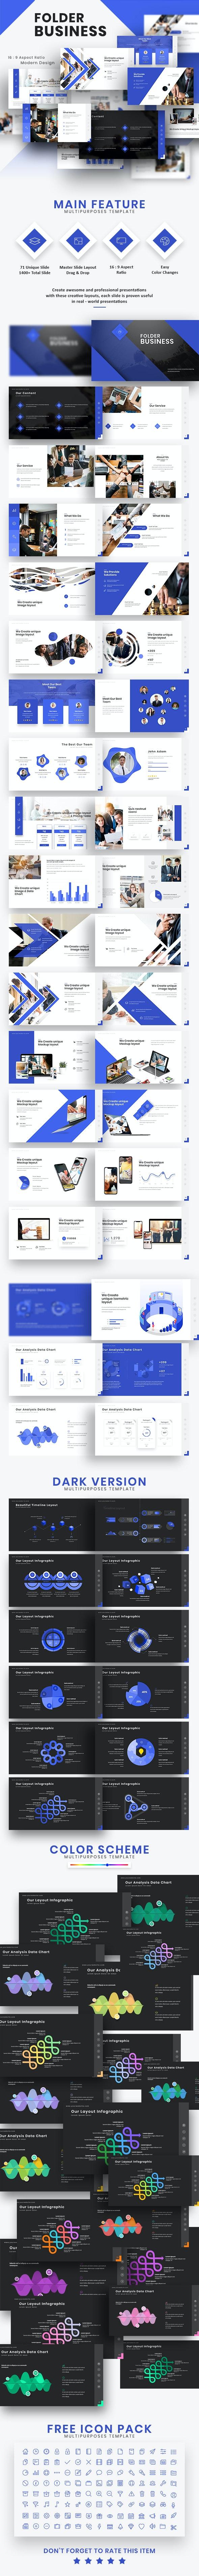 Folder Business Presentation Template - Business PowerPoint Templates